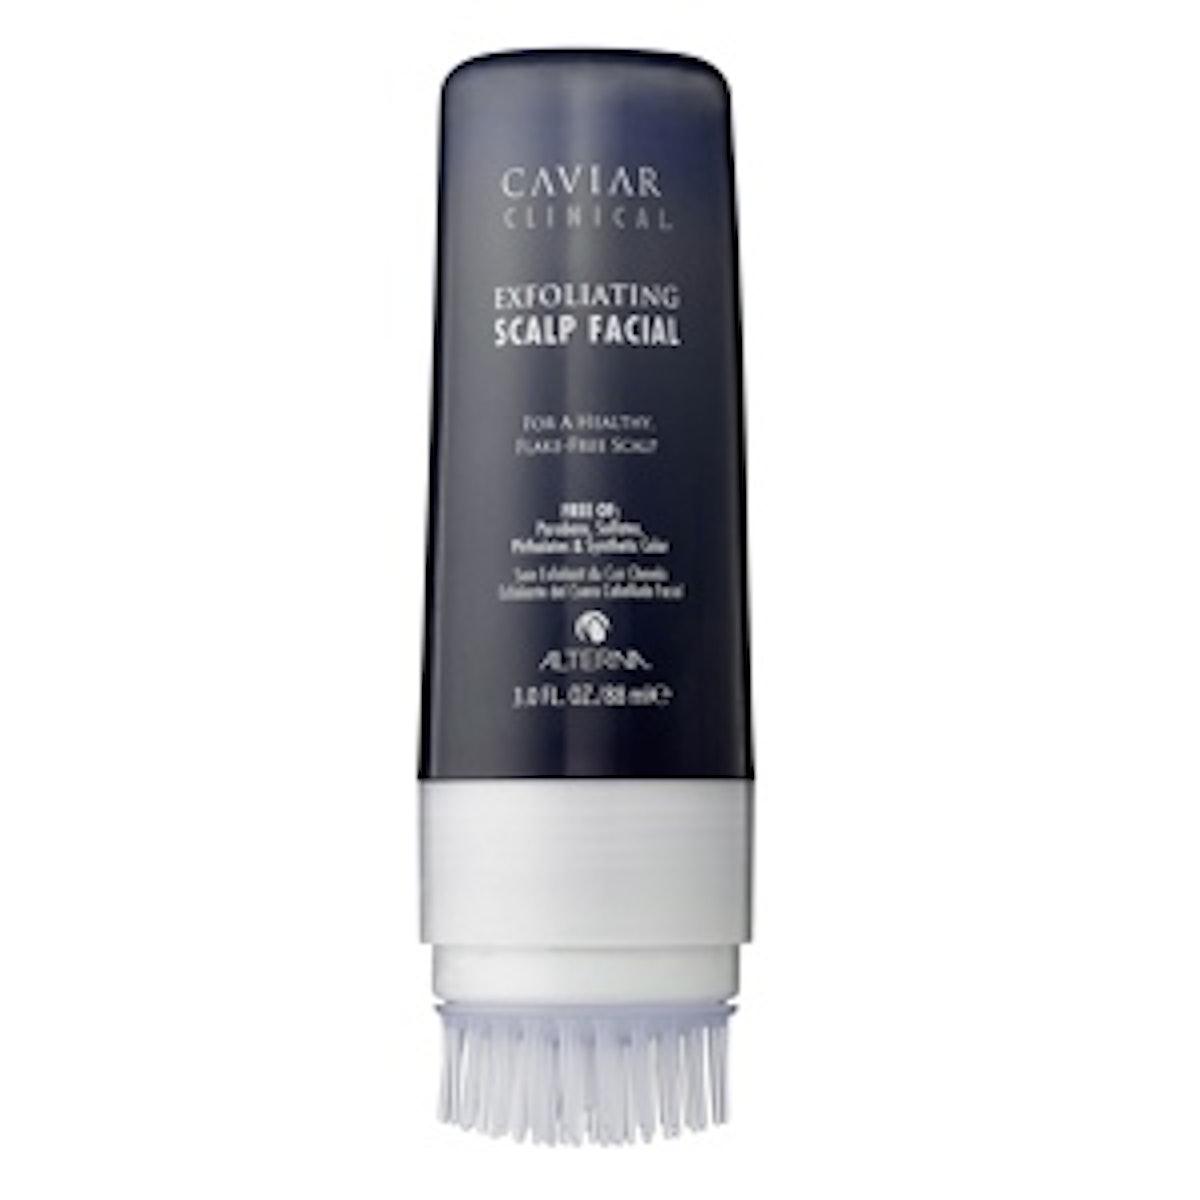 Caviar Clinical Exfoliating Scalp Facial